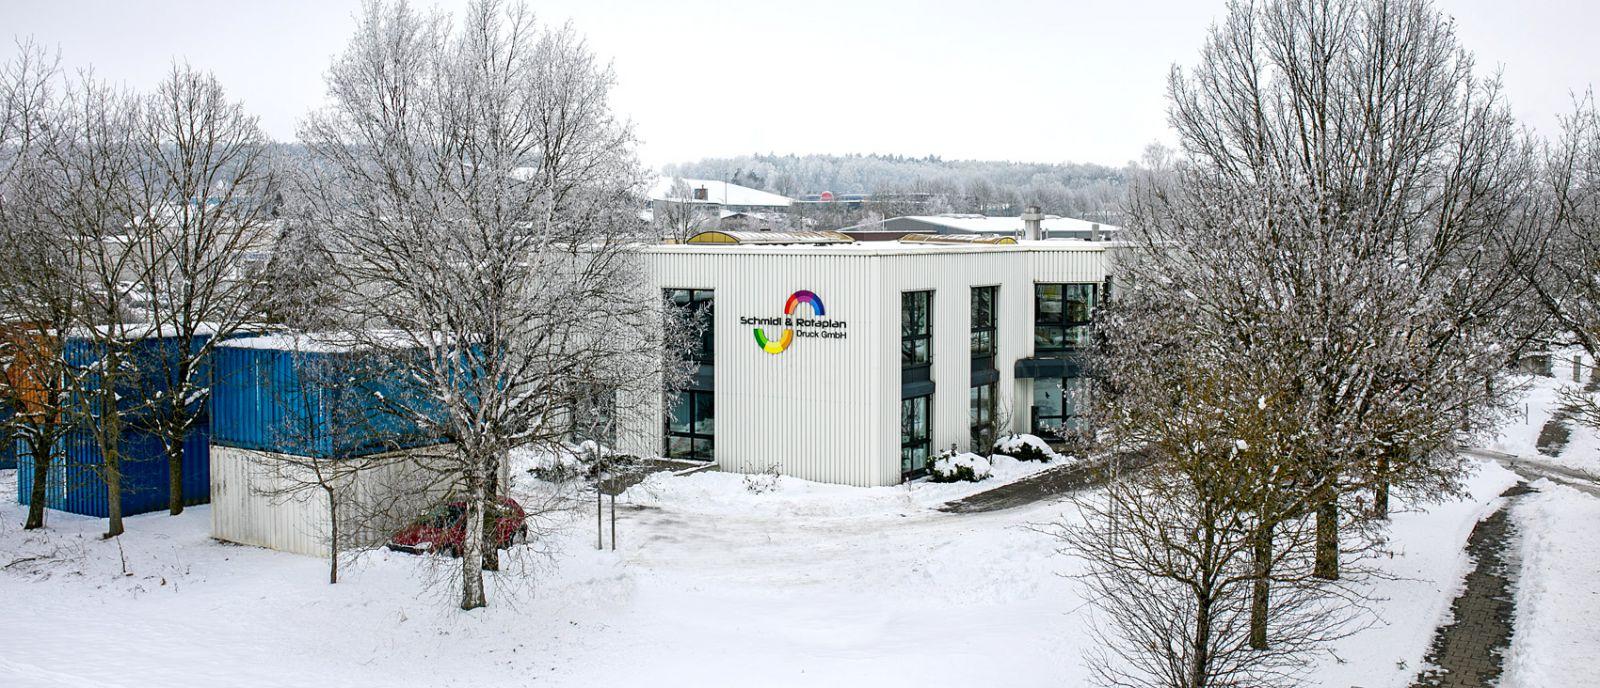 Home Schmidl Rotaplan Druck Gmbh